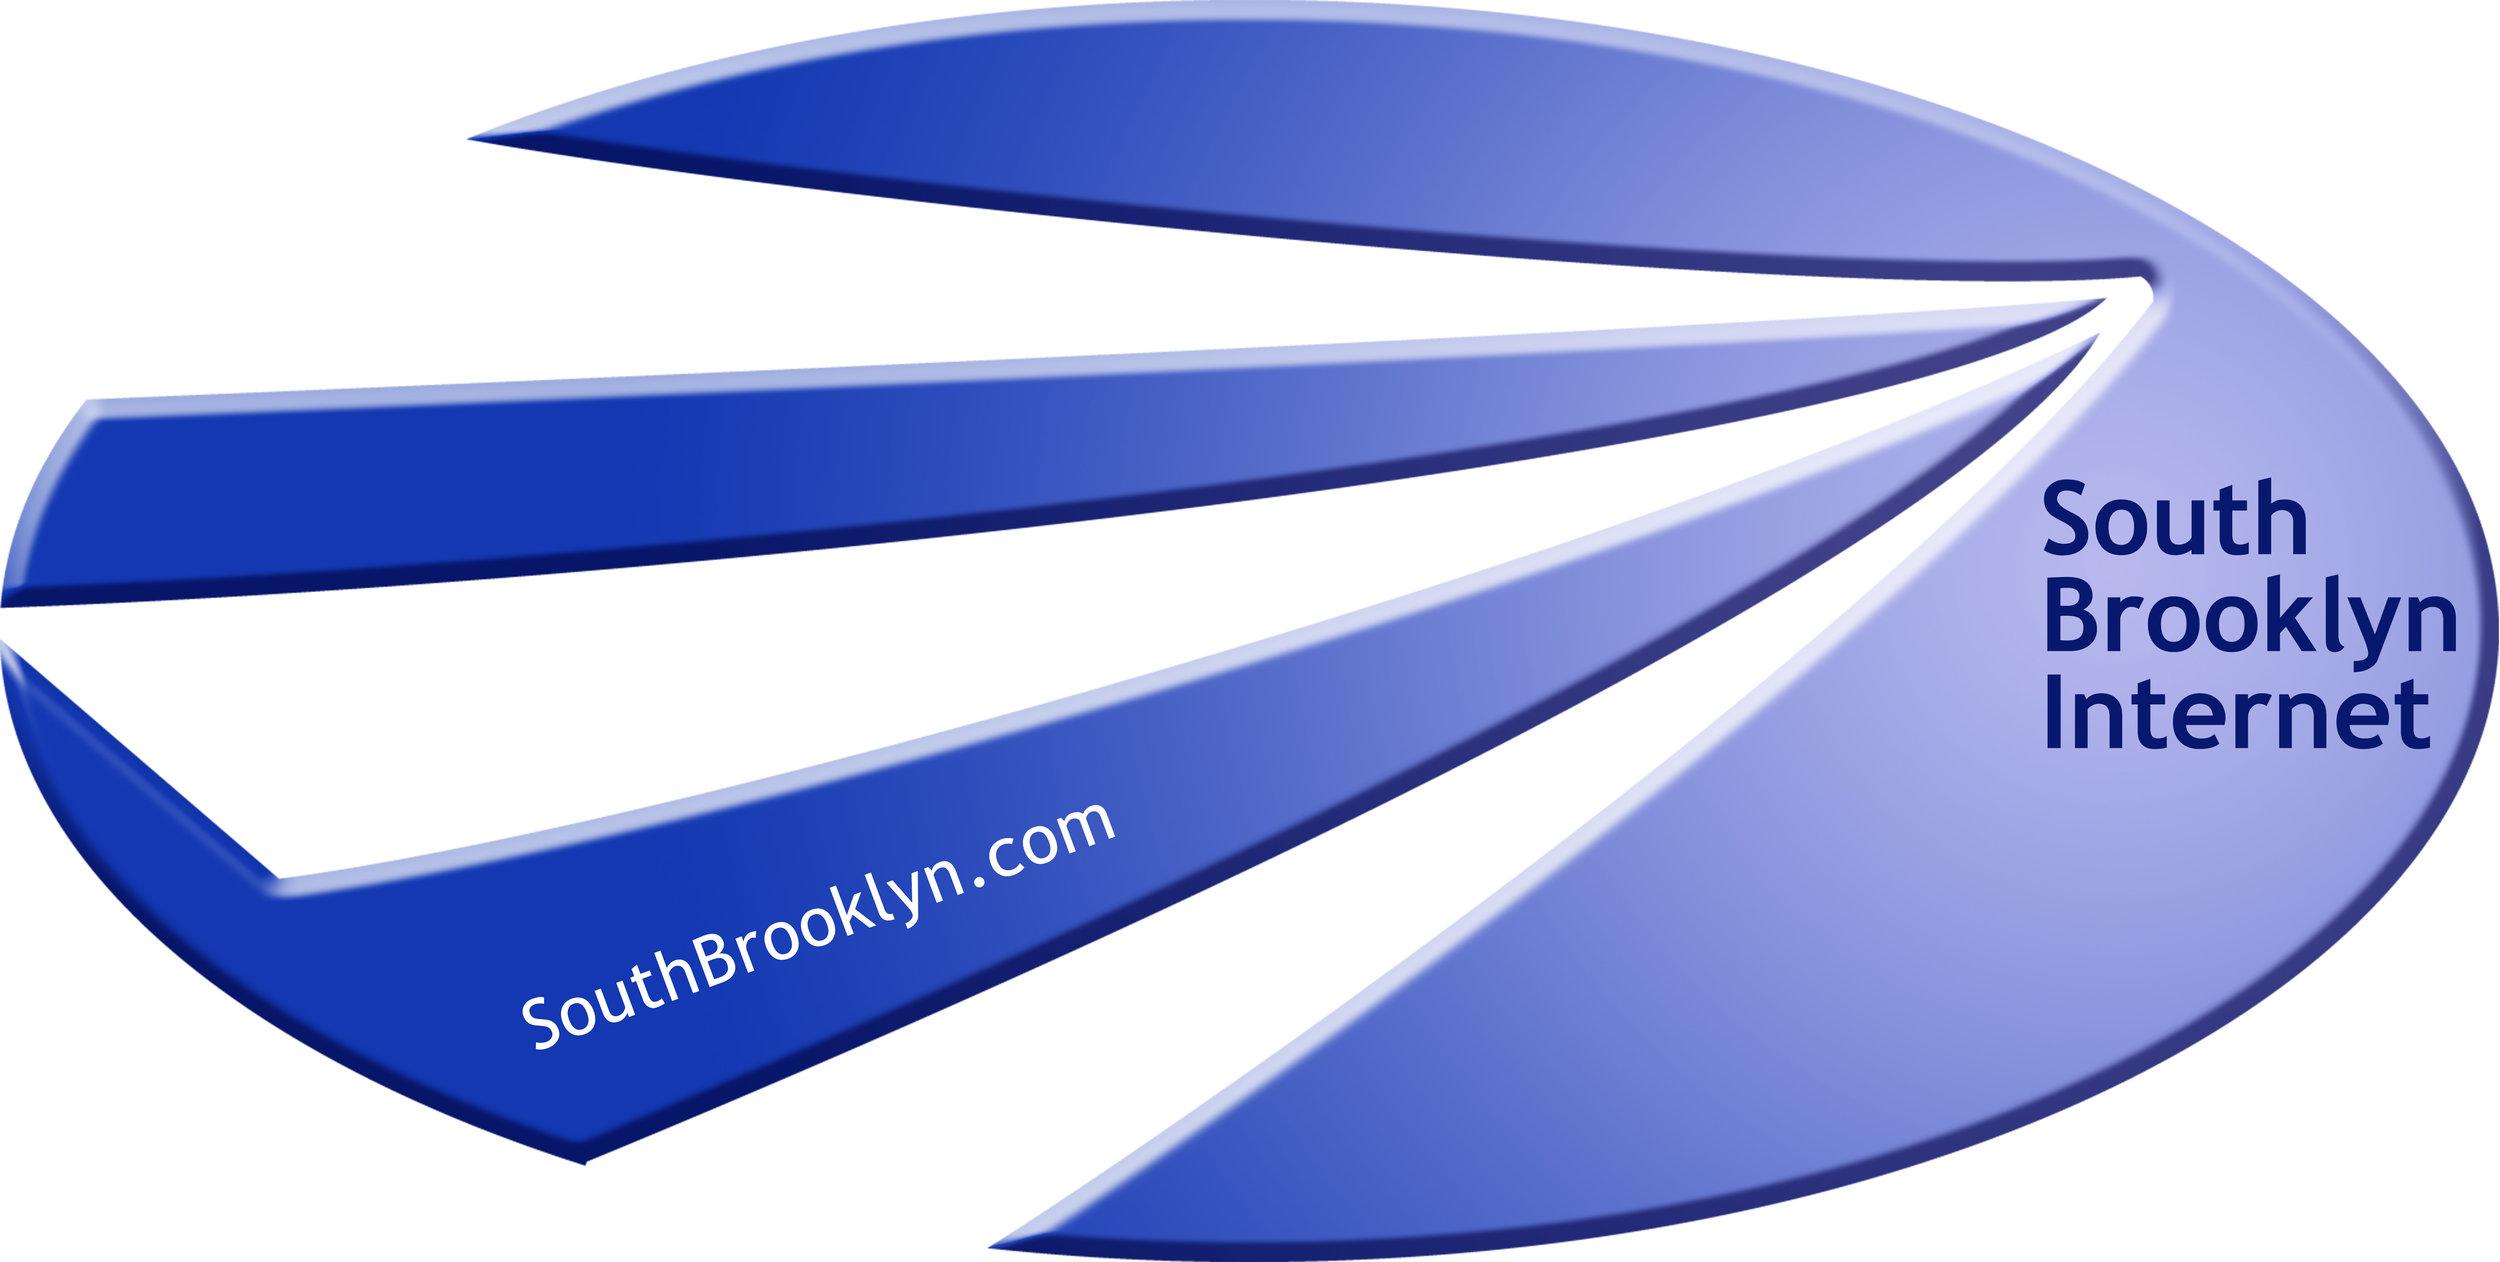 SBN_logo_bevel_SBI_300dpi.jpg